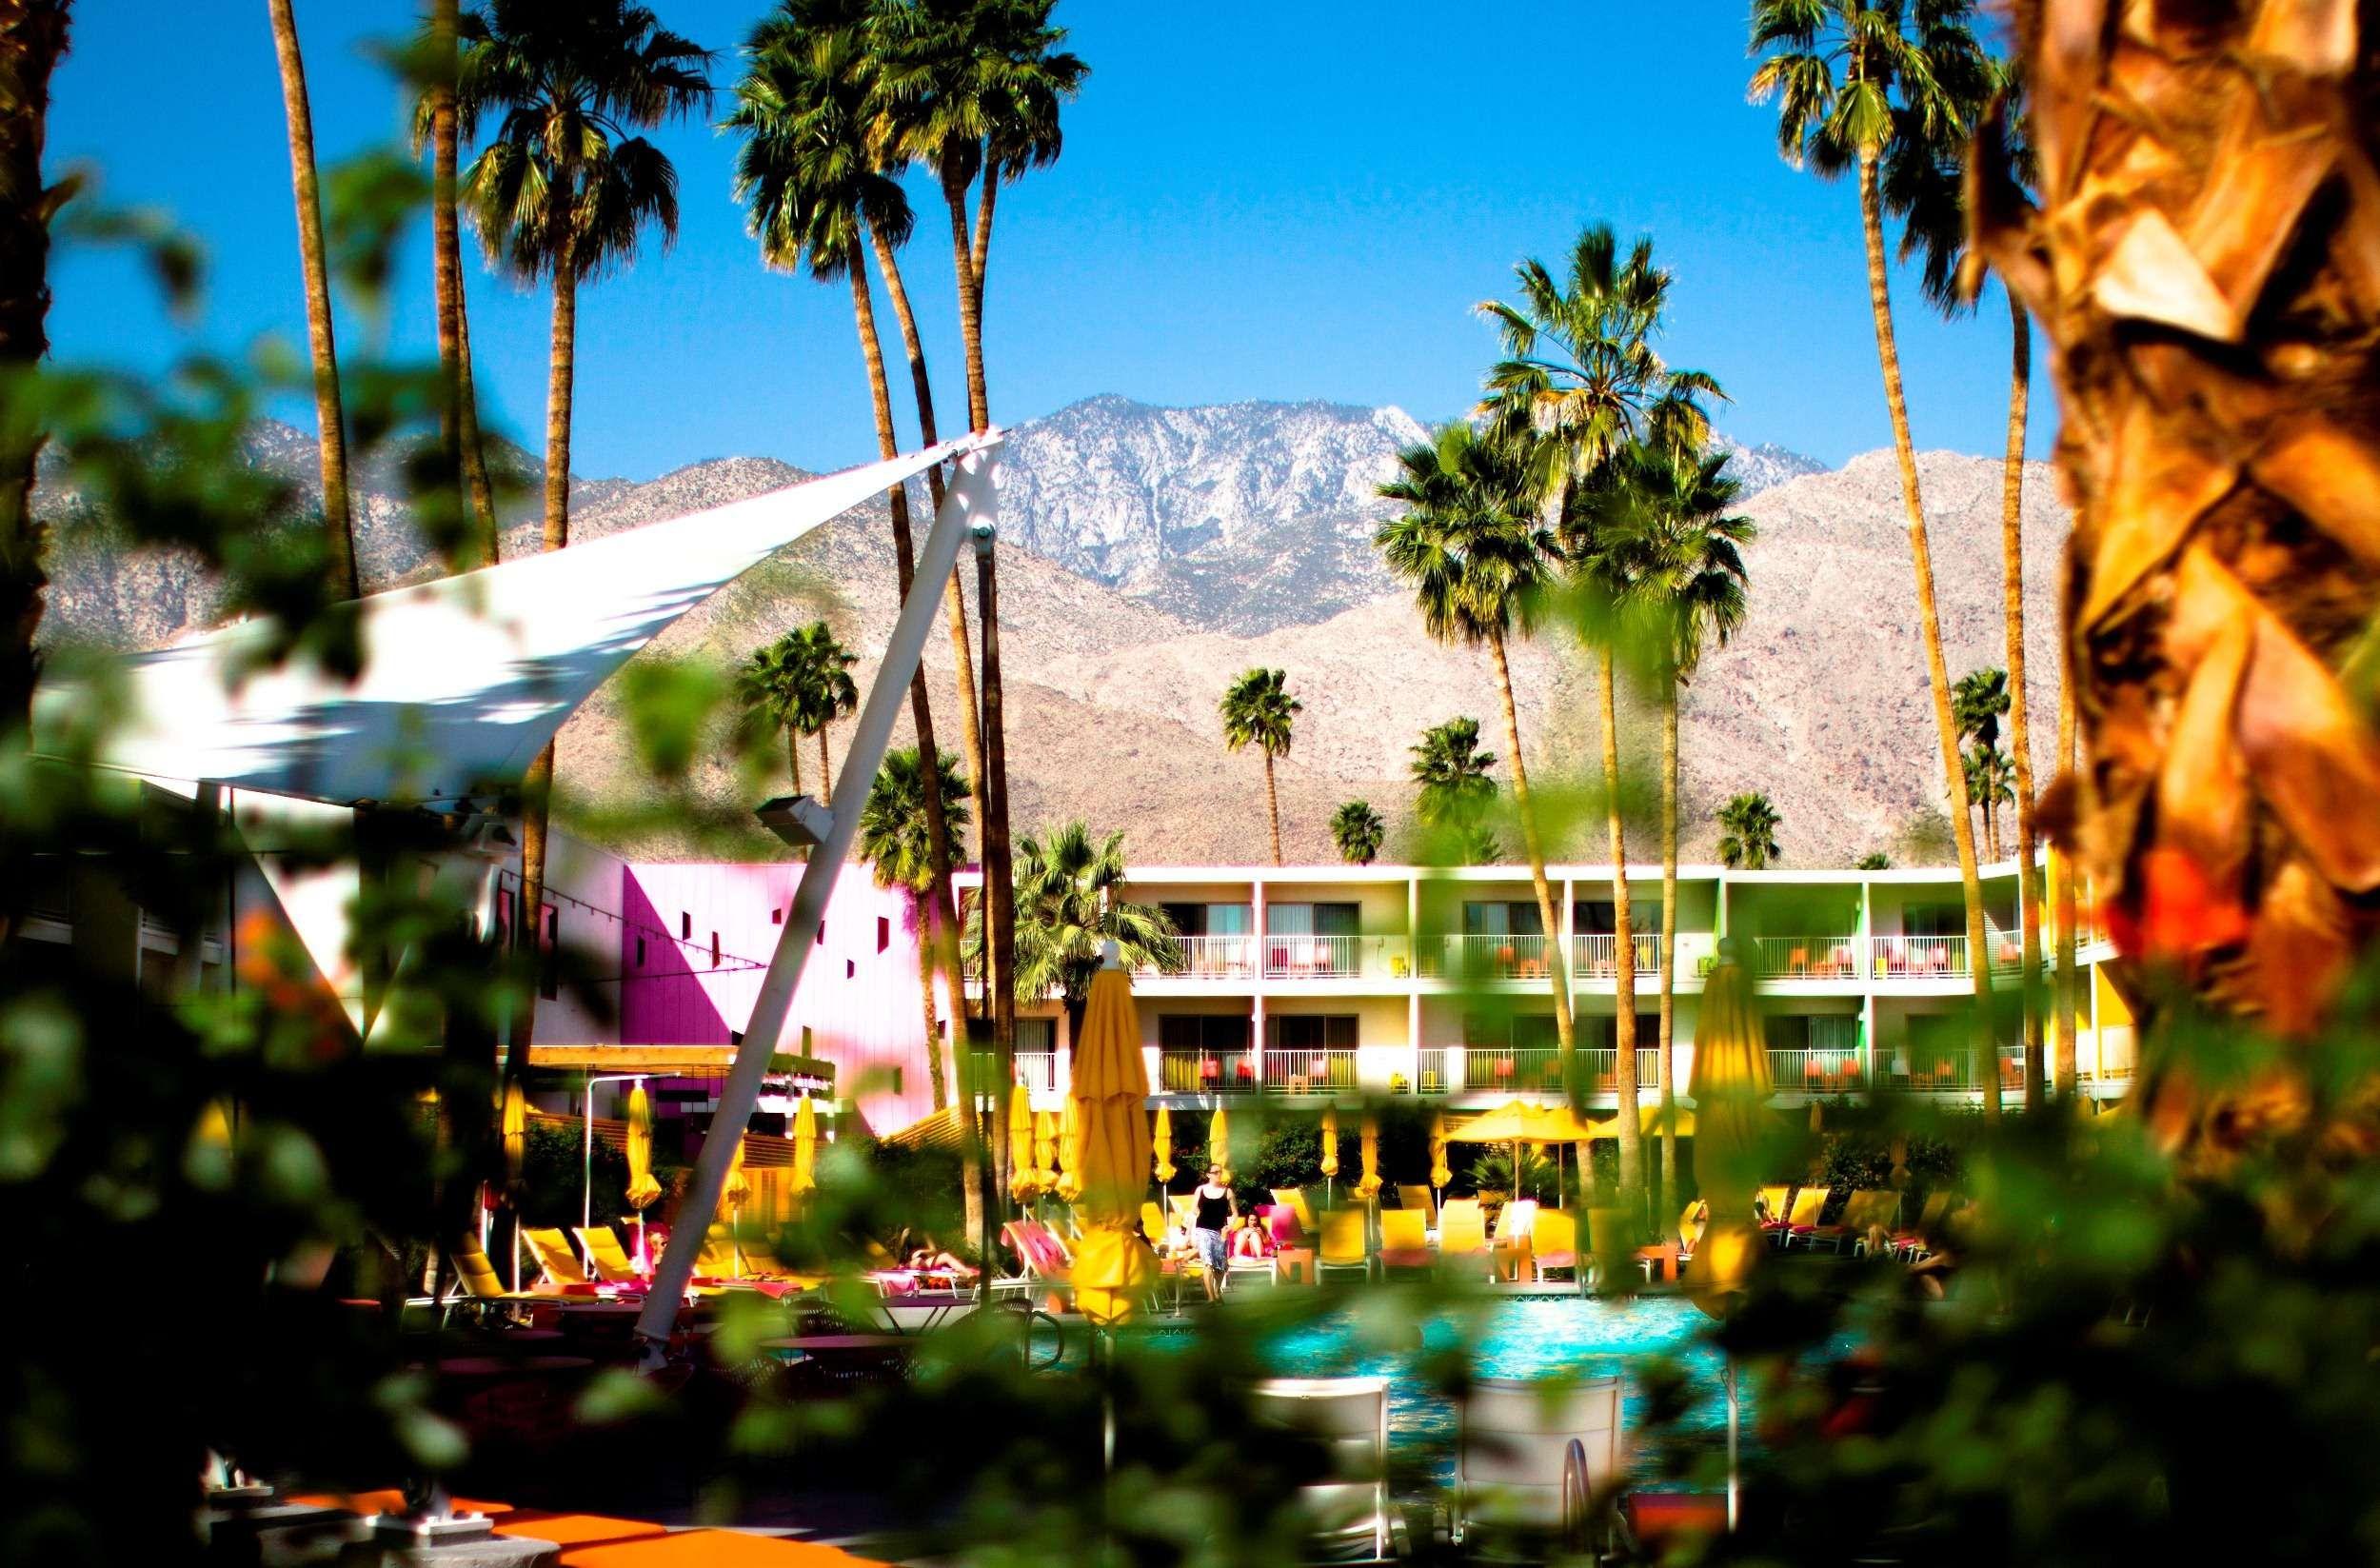 Merveilleux The Saguaro Palm Springs, A Joie De Vivre Hotel In Palm Springs, CA THE